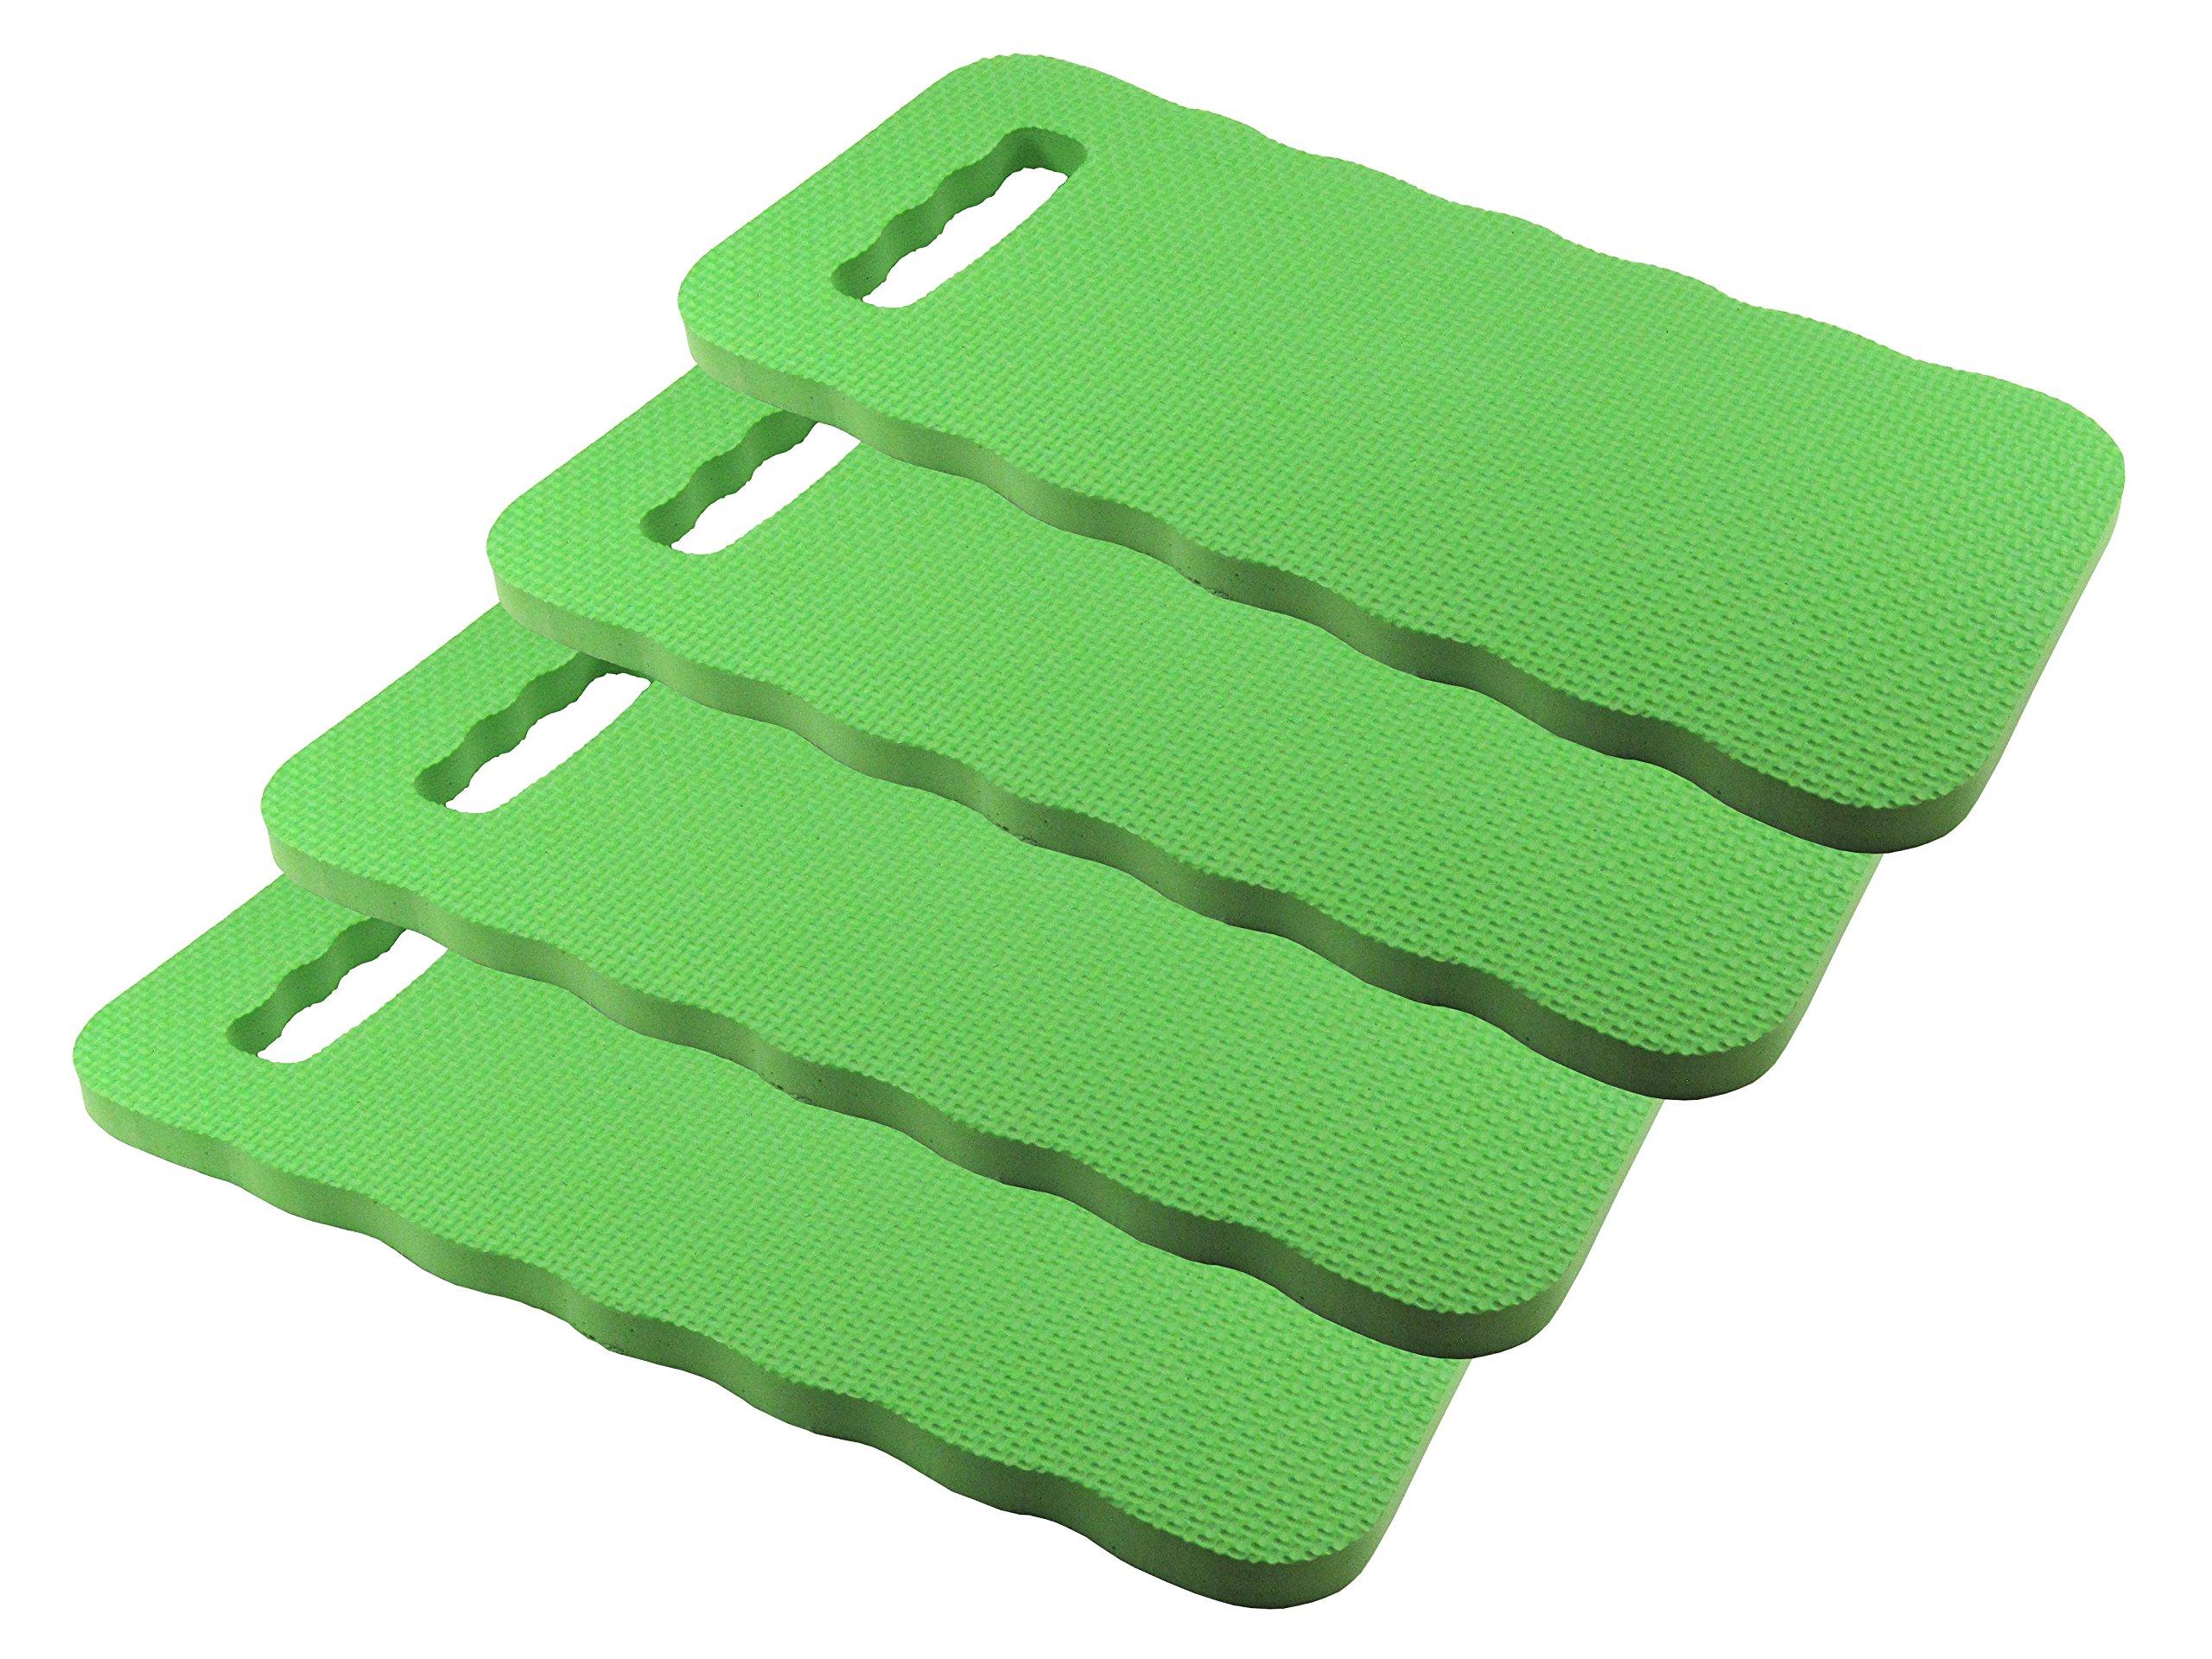 Elitexion Kneeling Pad, Knee Protection for Garden Kneeler, Yoga Kneeler, Exercise and Cleaning Kneeler (Pack of 4)